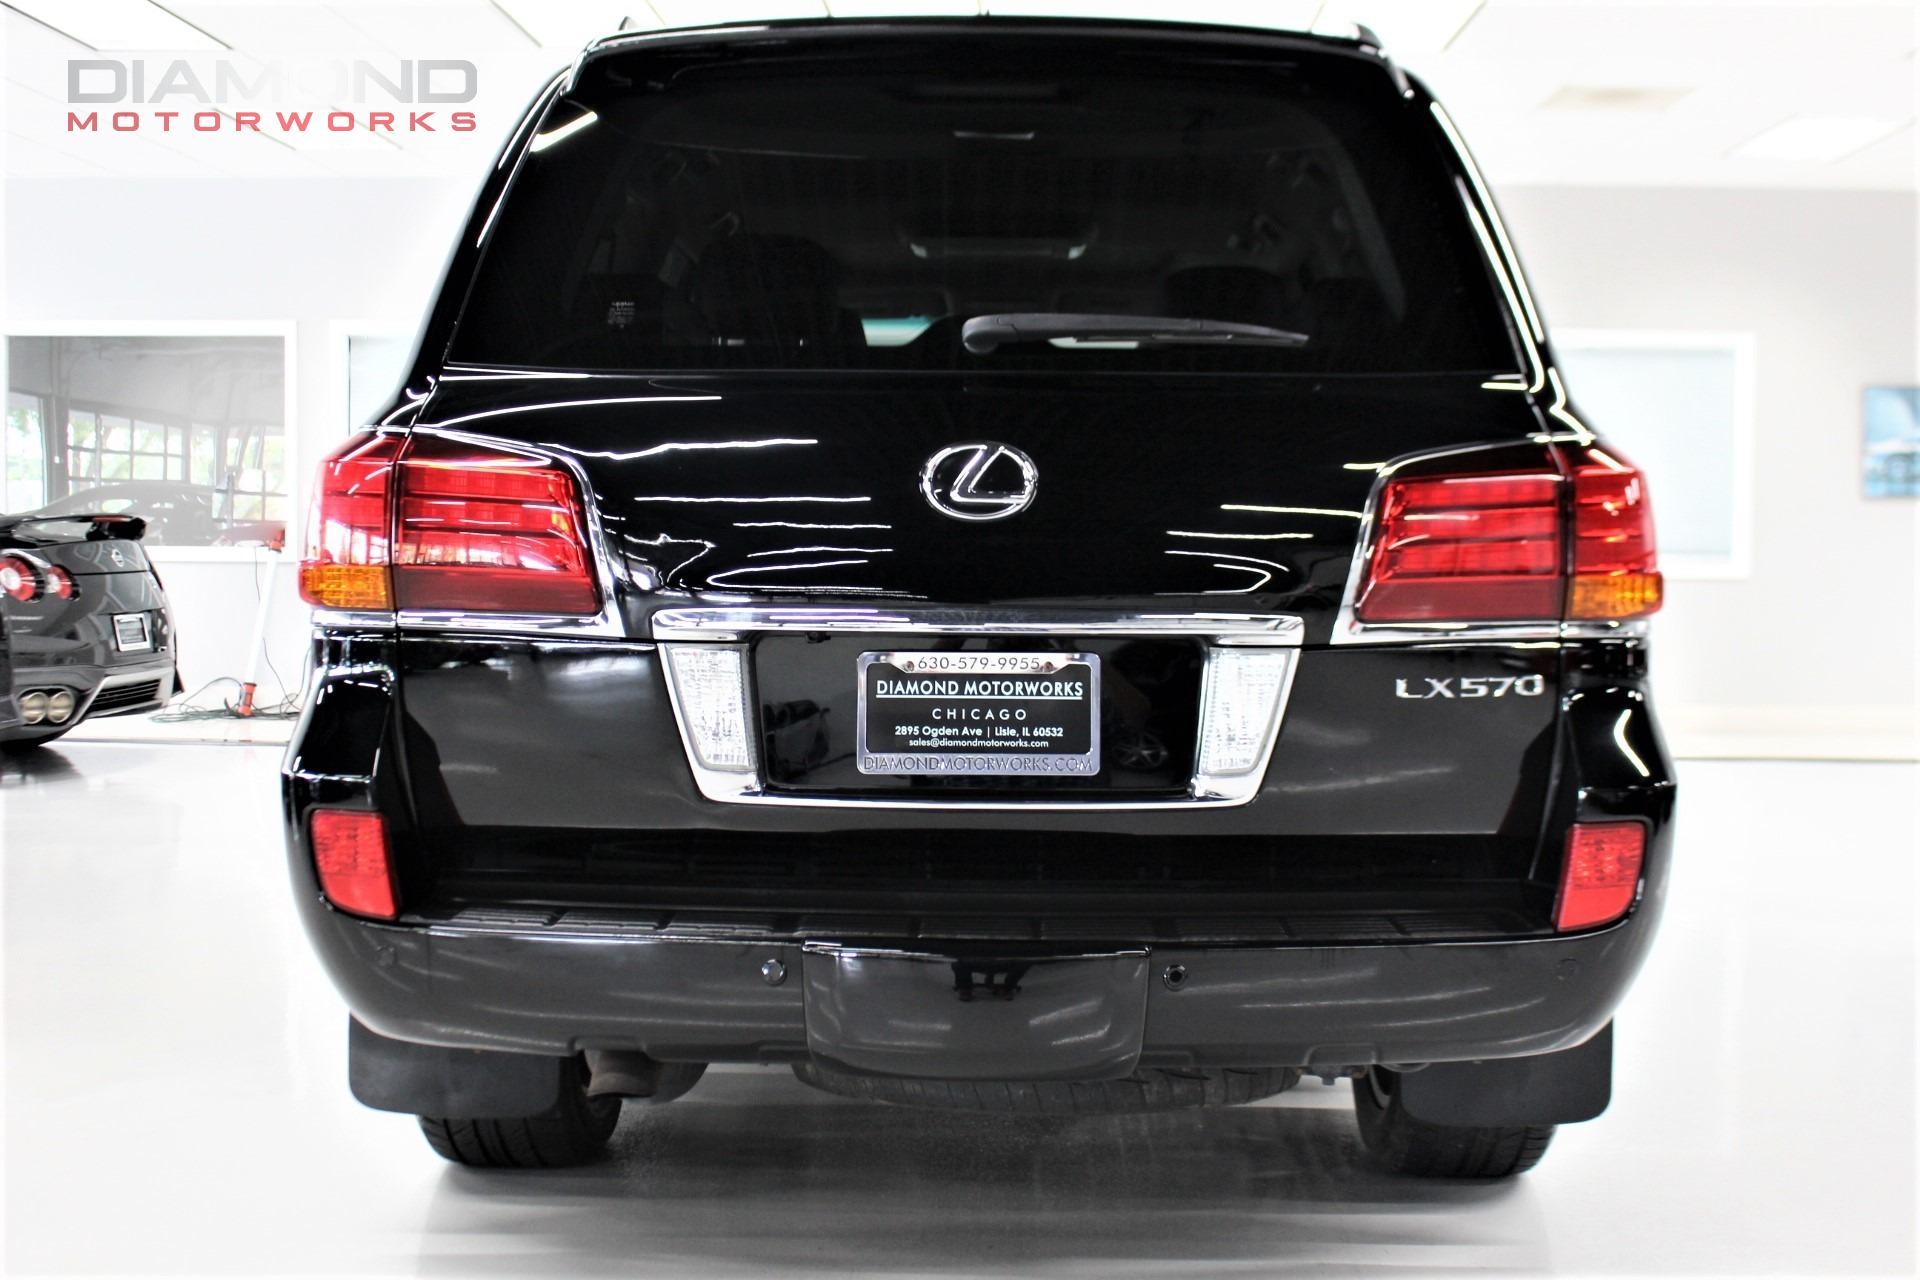 2011 Lexus LX 570 Stock # 081505 for sale near Lisle, IL